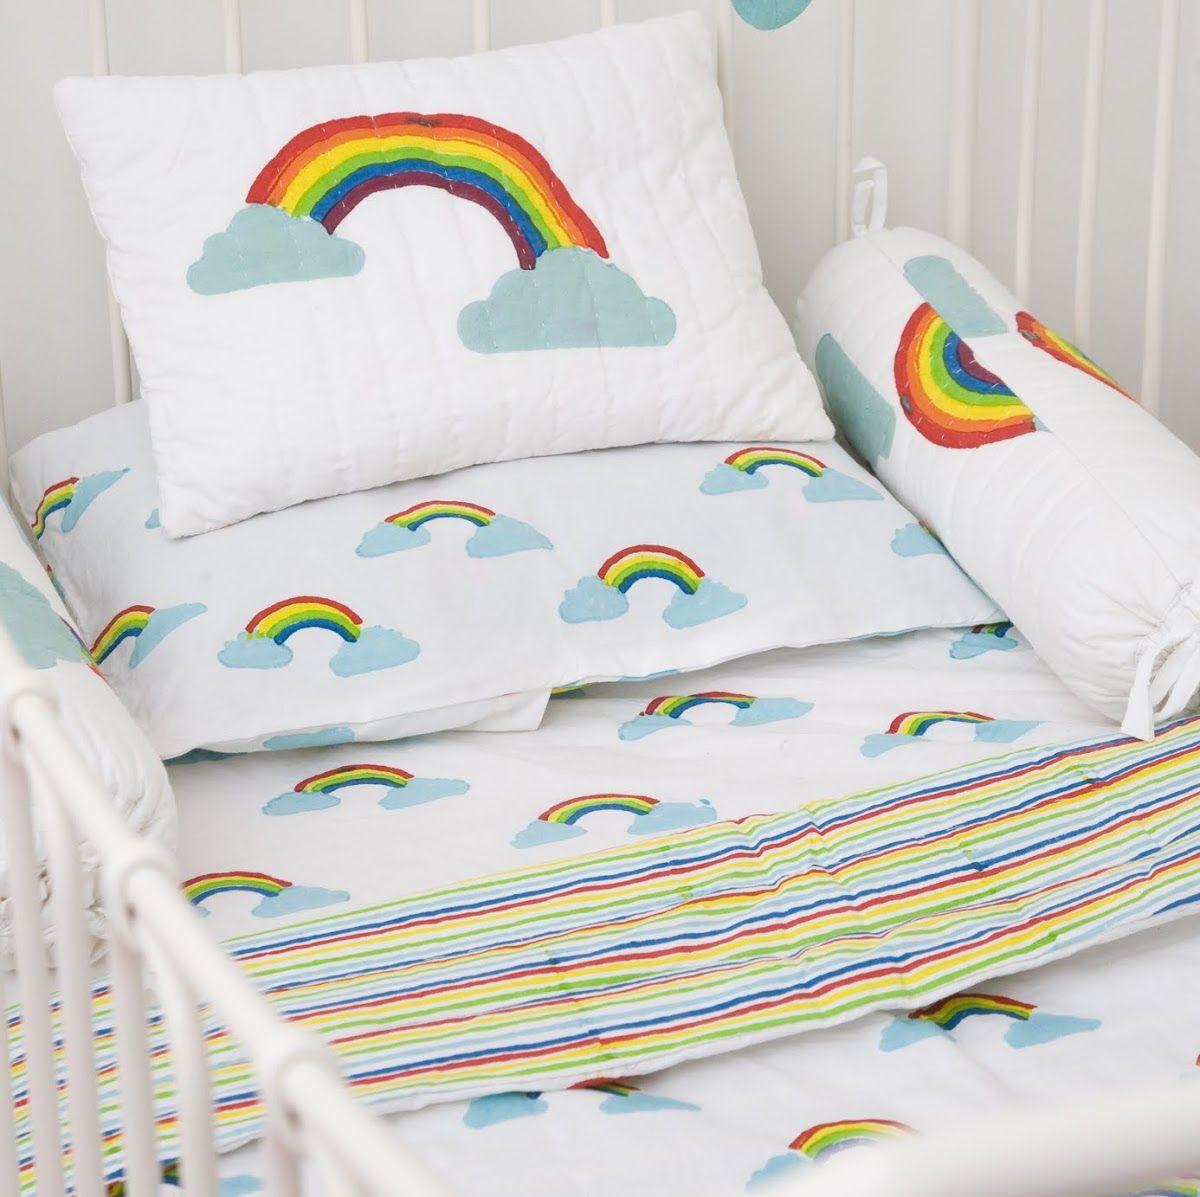 Lulu Amp Nat Nursery Bedding Toddler Bedding Rainbow